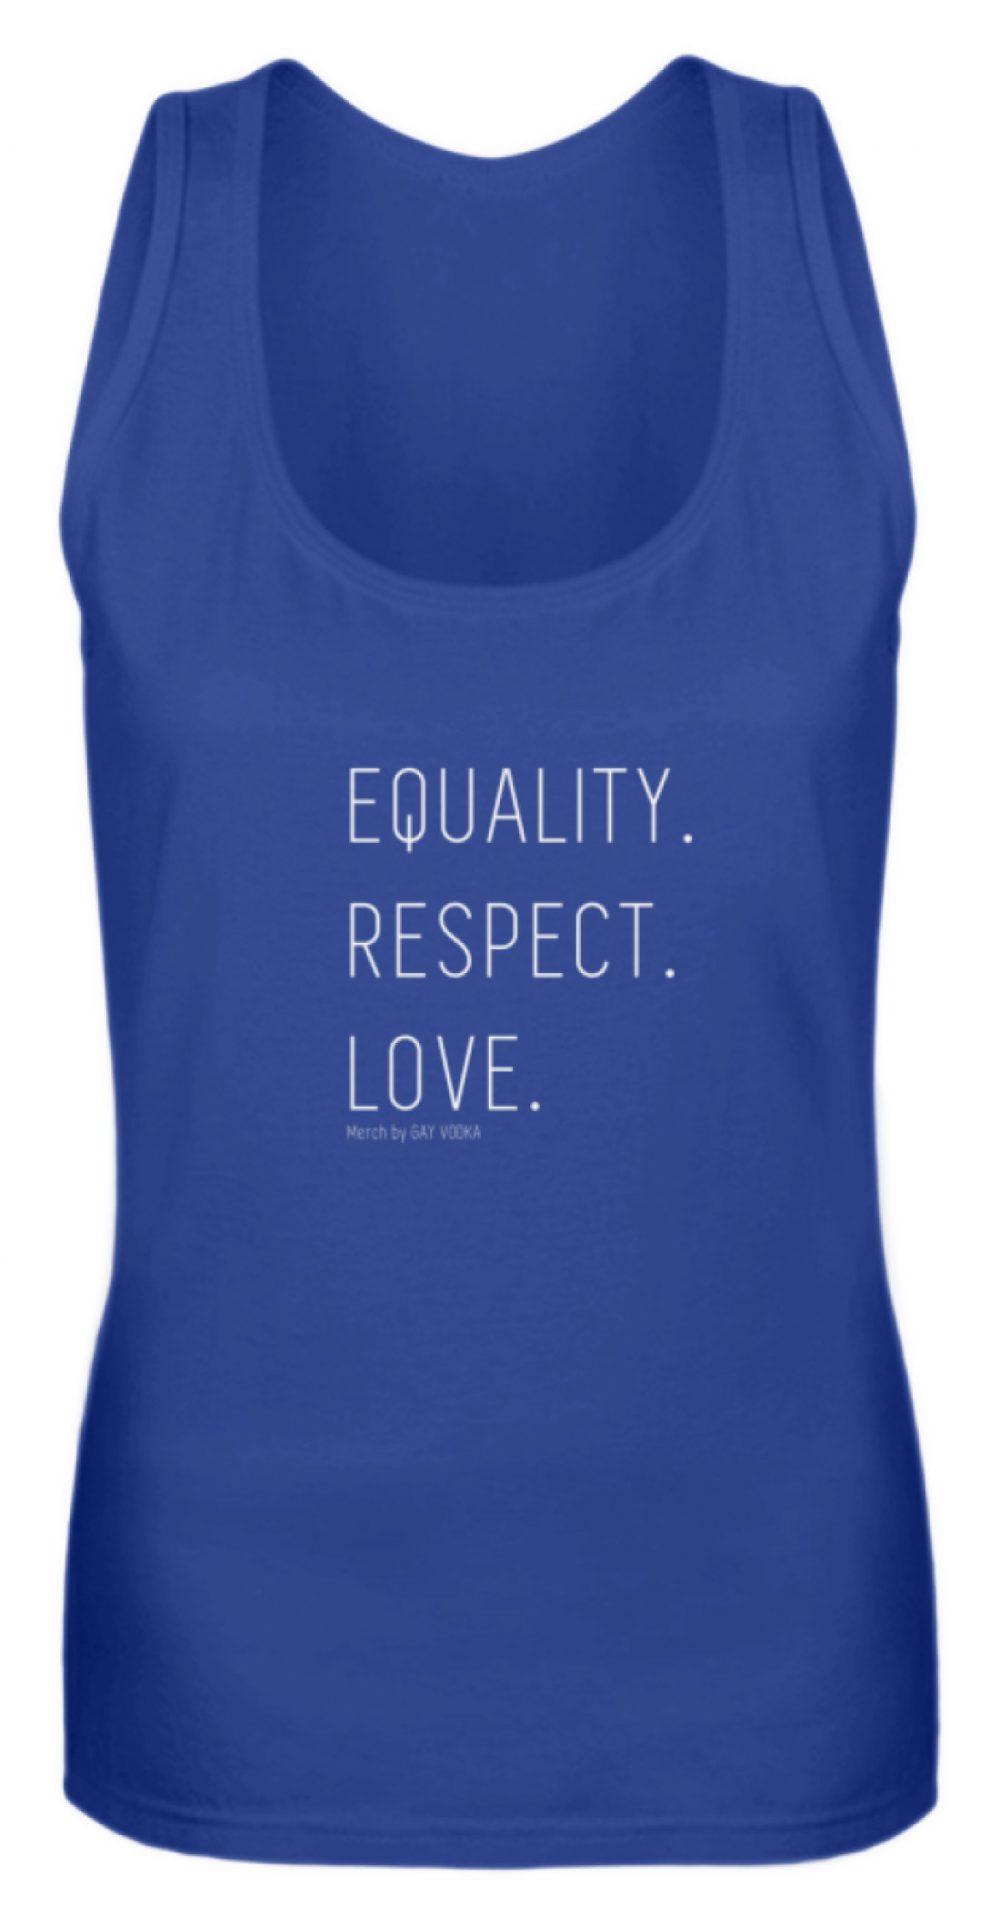 EQUALITY. RESPECT. LOVE. - Frauen Tanktop-27